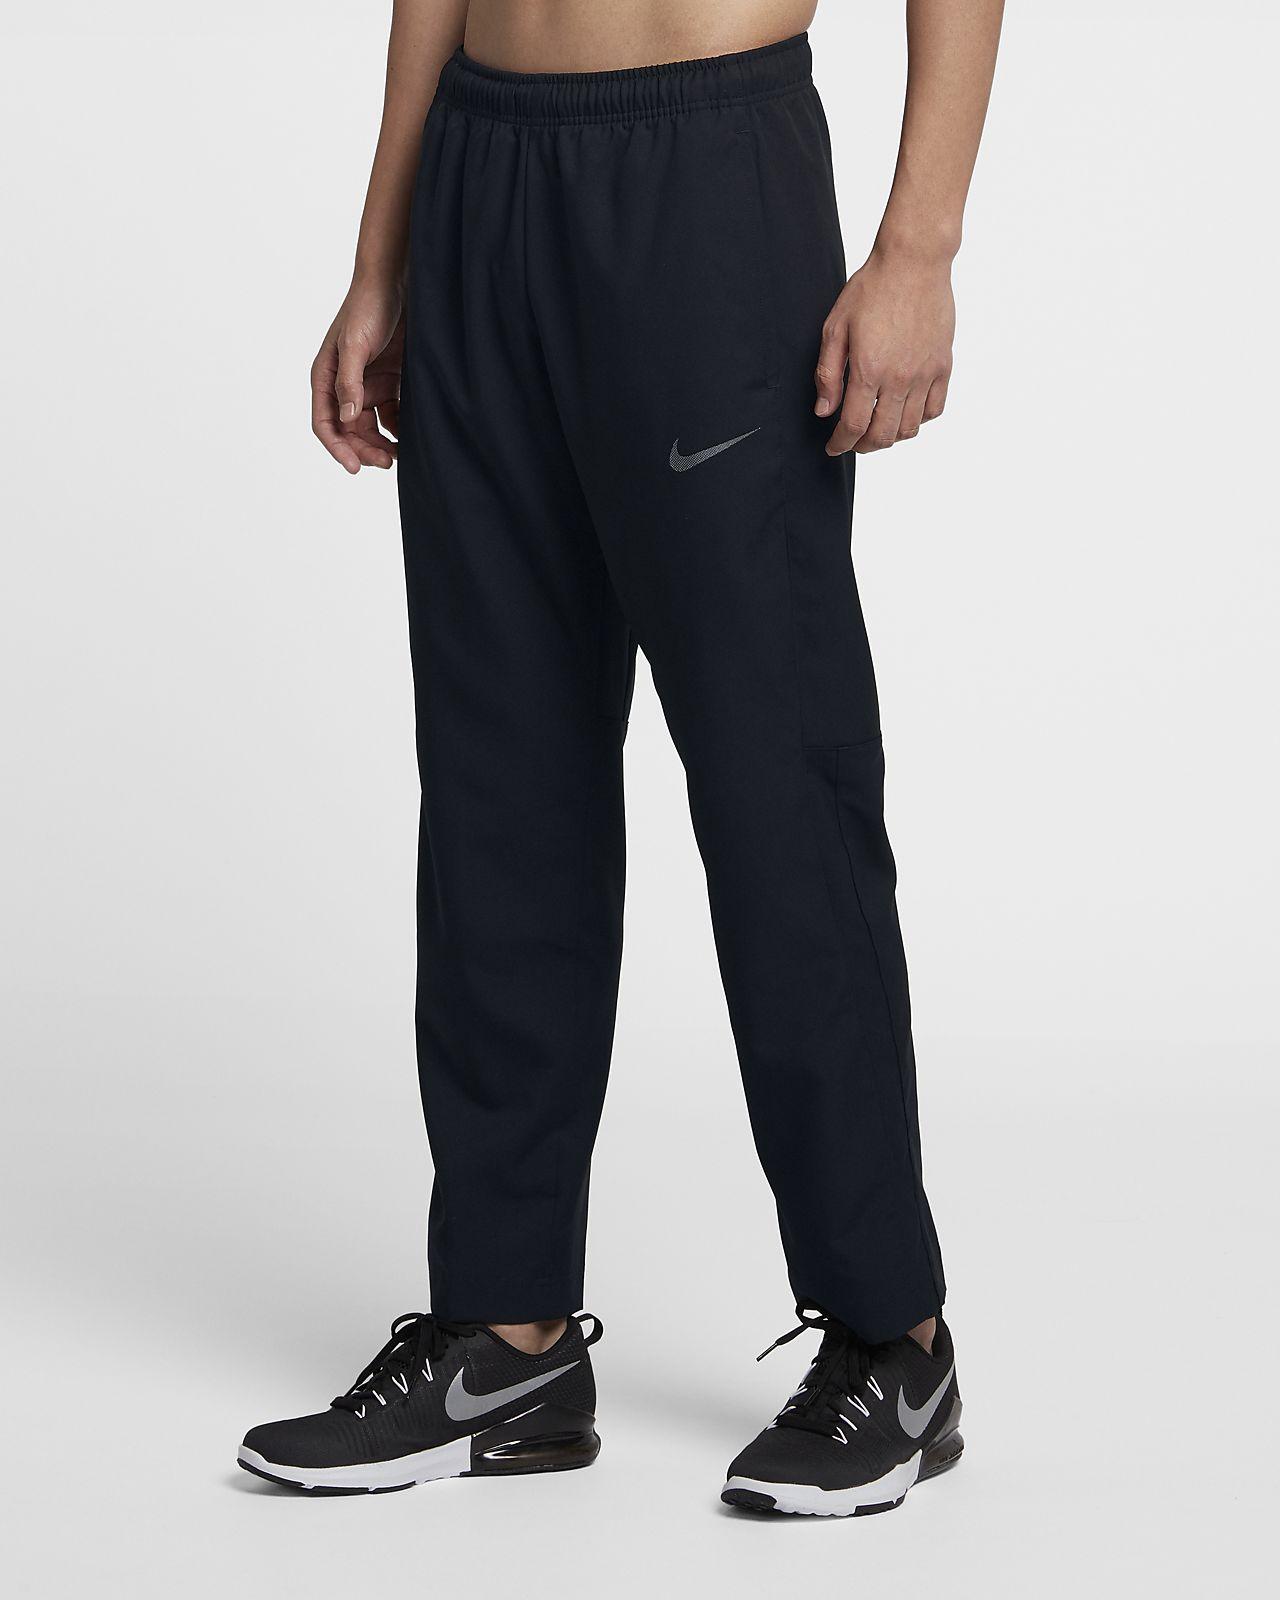 Nike Dri-FIT Herren-Trainingshose